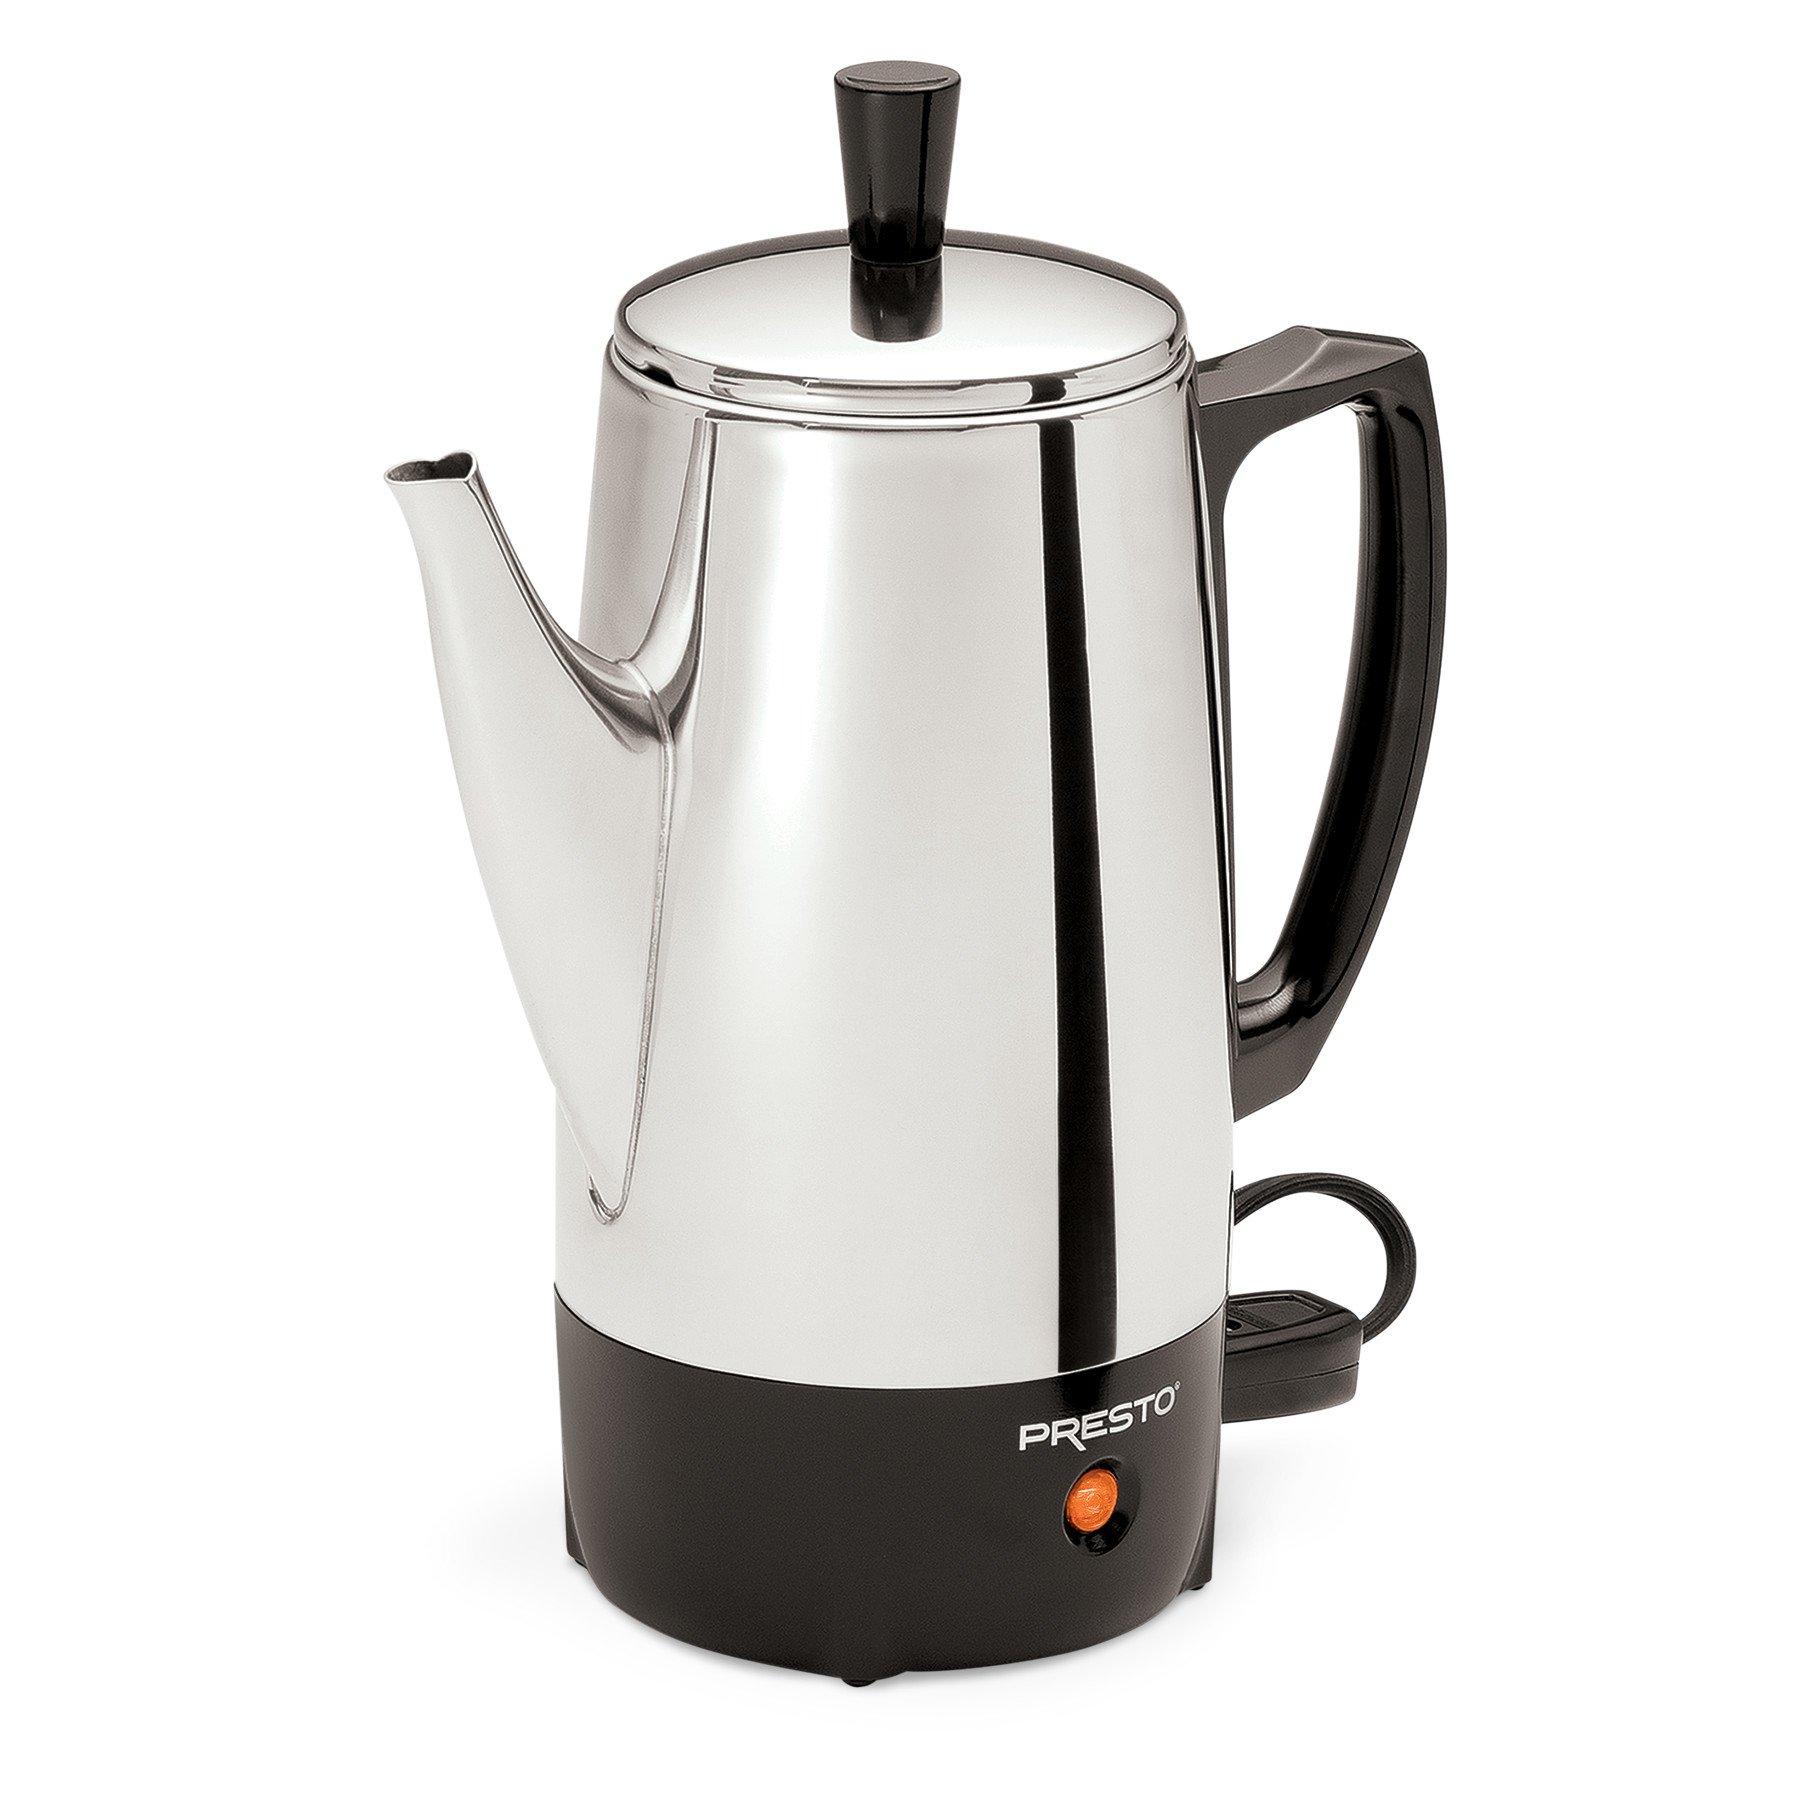 Presto 02822 6-Cup Stainless-Steel Coffee Percolator by Presto